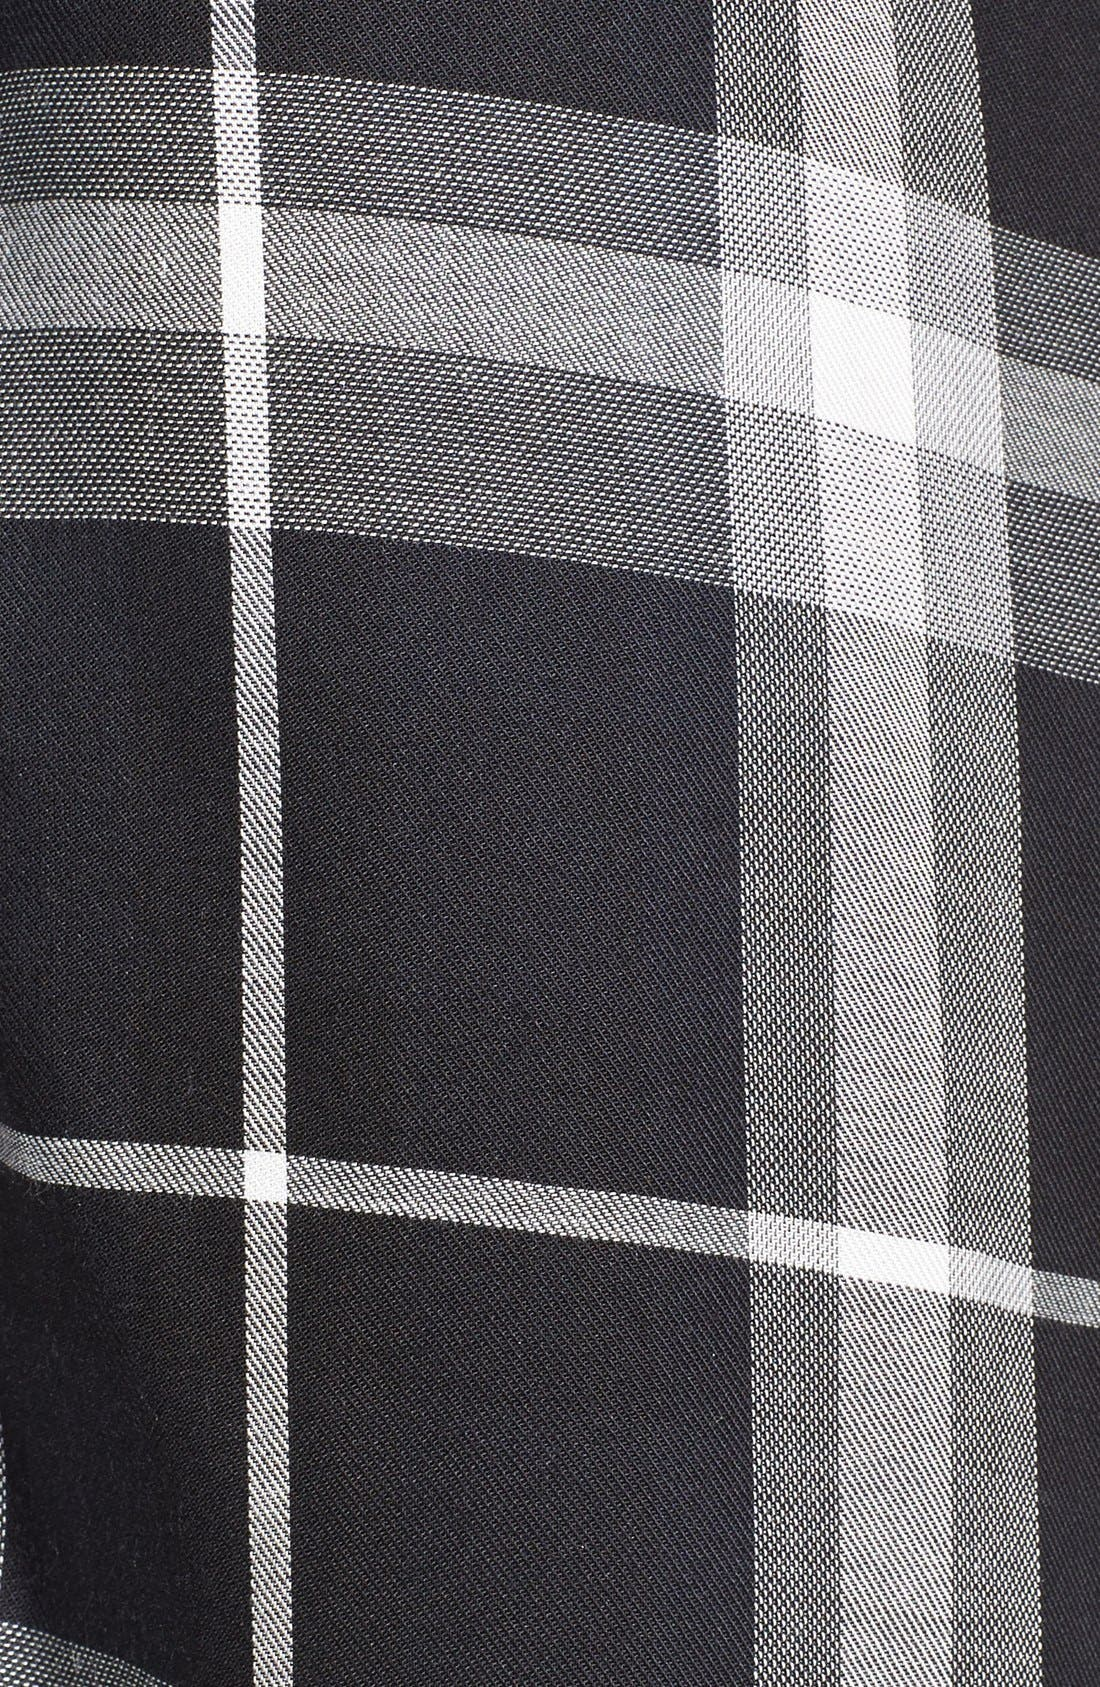 'Coley' Plaid Maxi Shirtdress,                             Alternate thumbnail 5, color,                             001